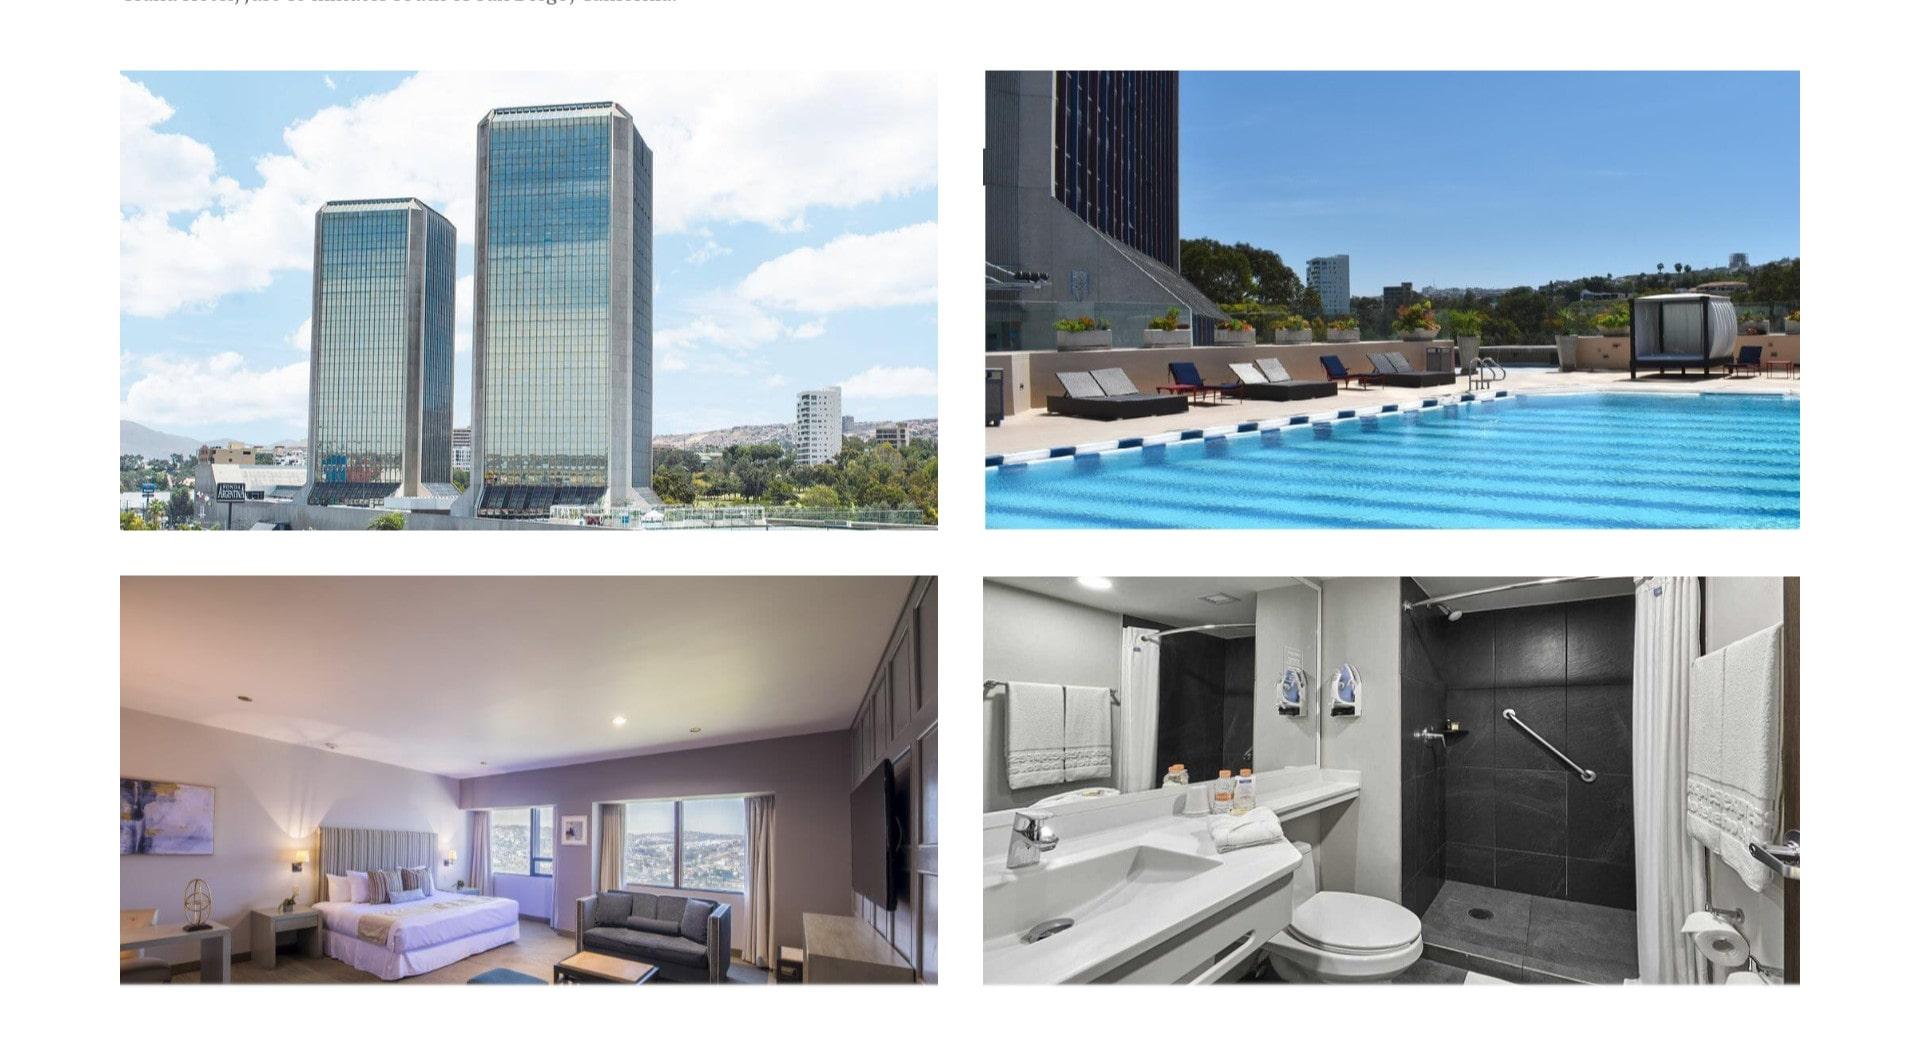 Lighter Dream Bariatrics Hotel Stay Grand Hotel